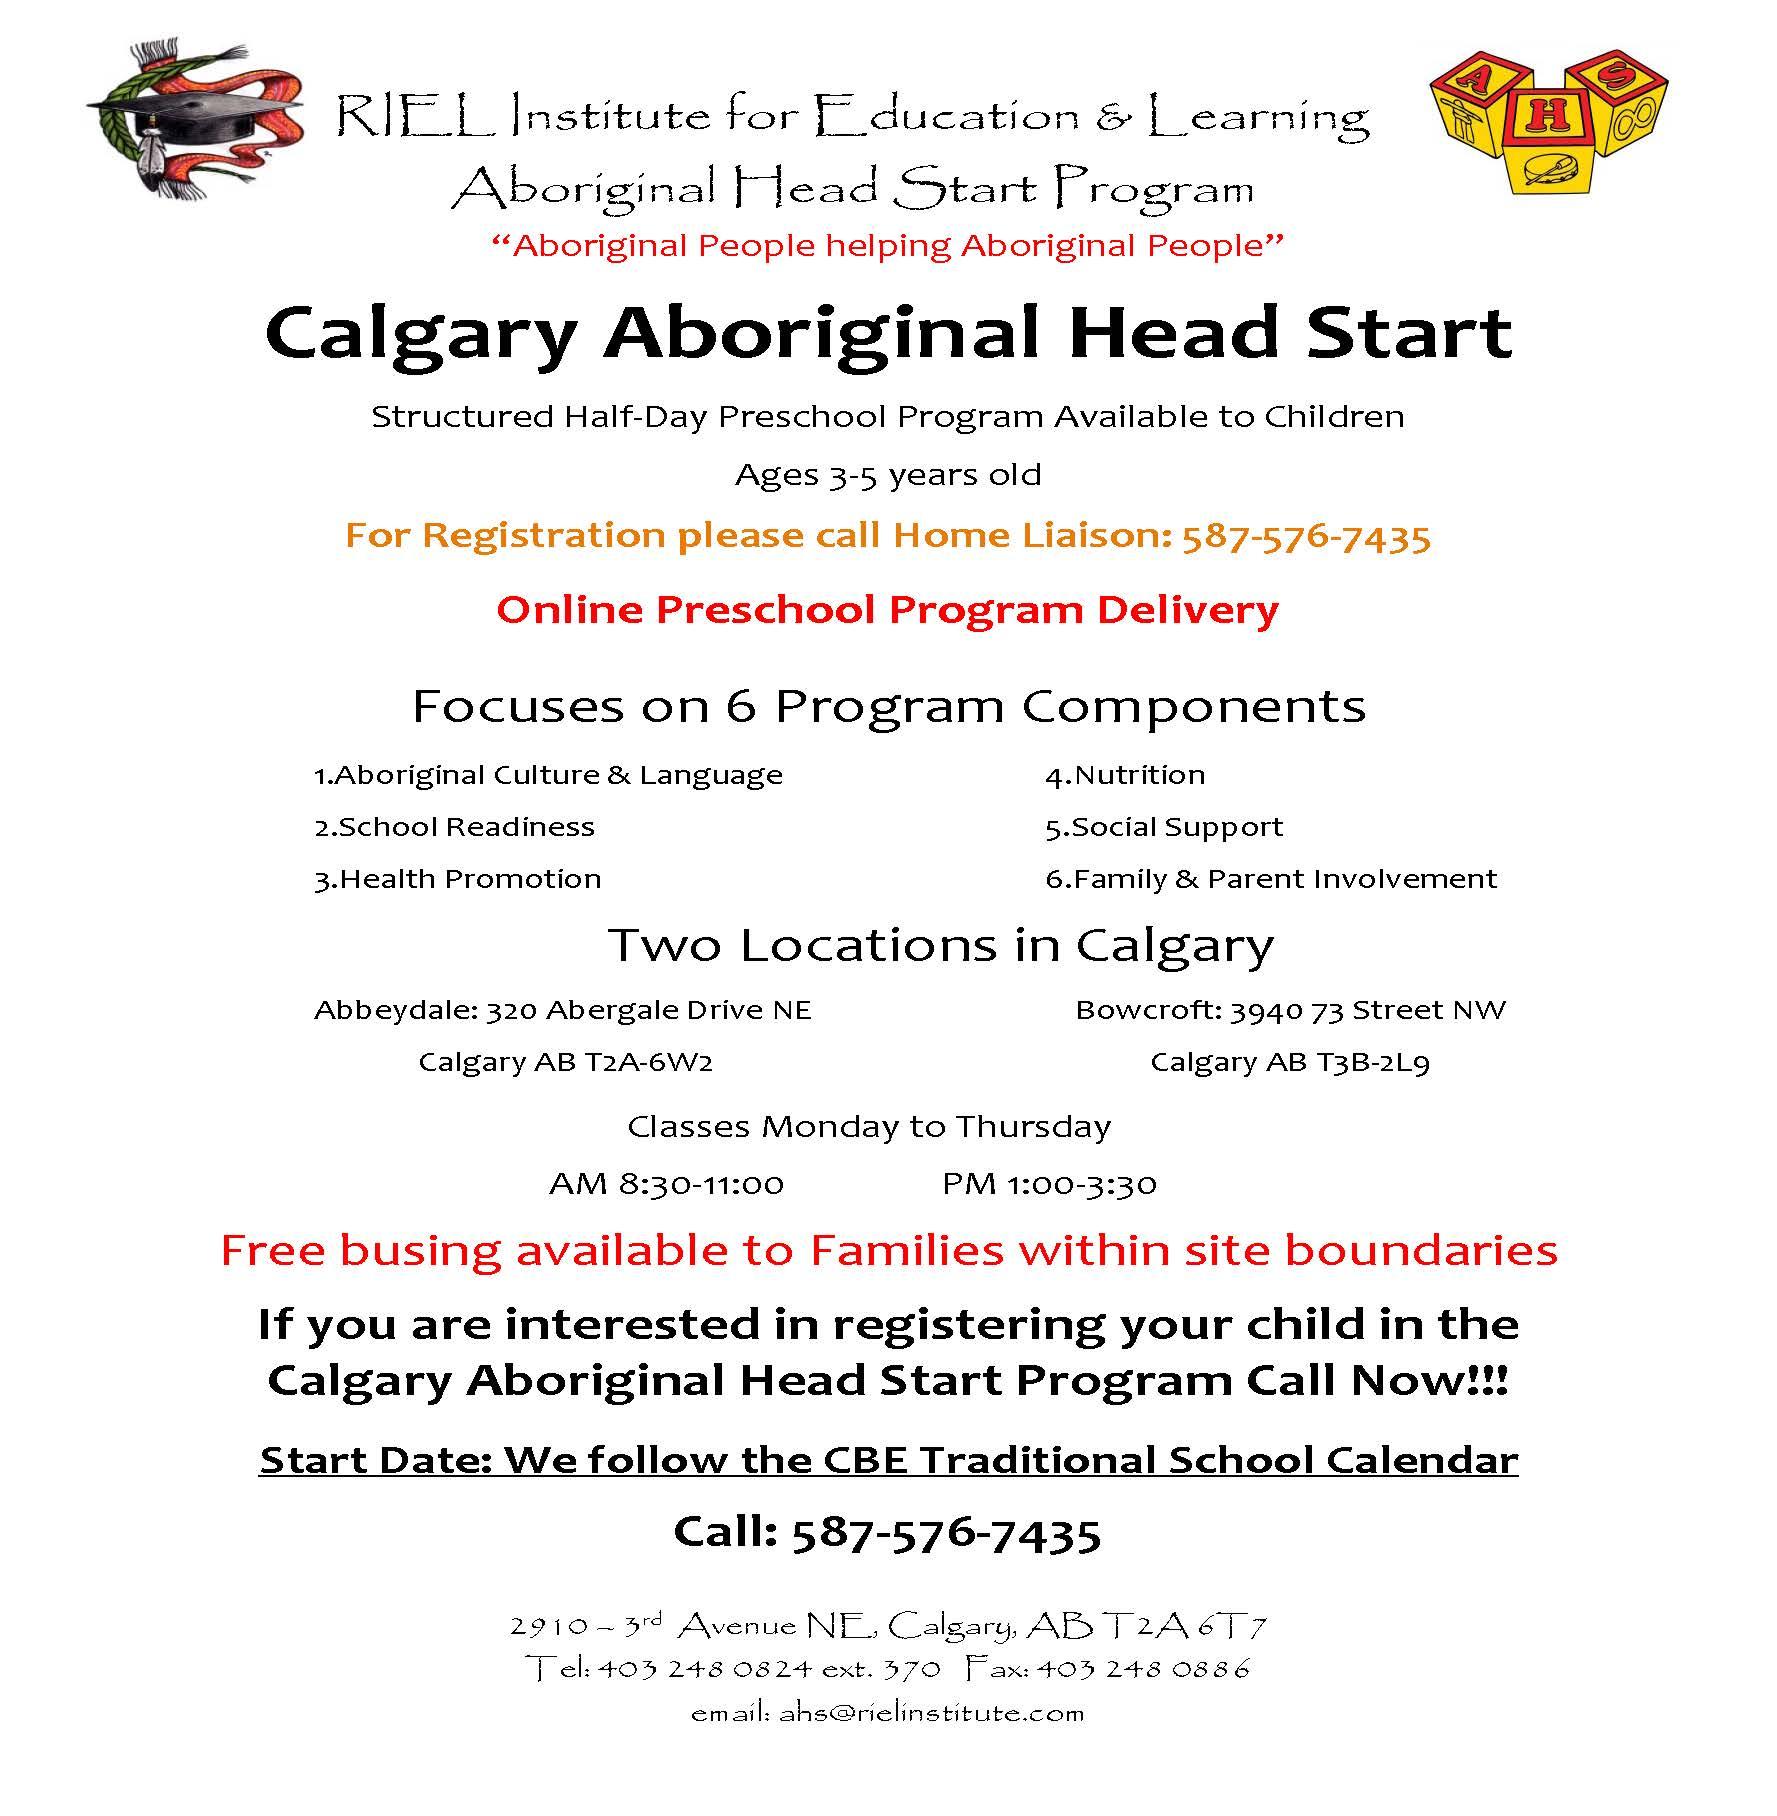 Aboriginal Head Start program